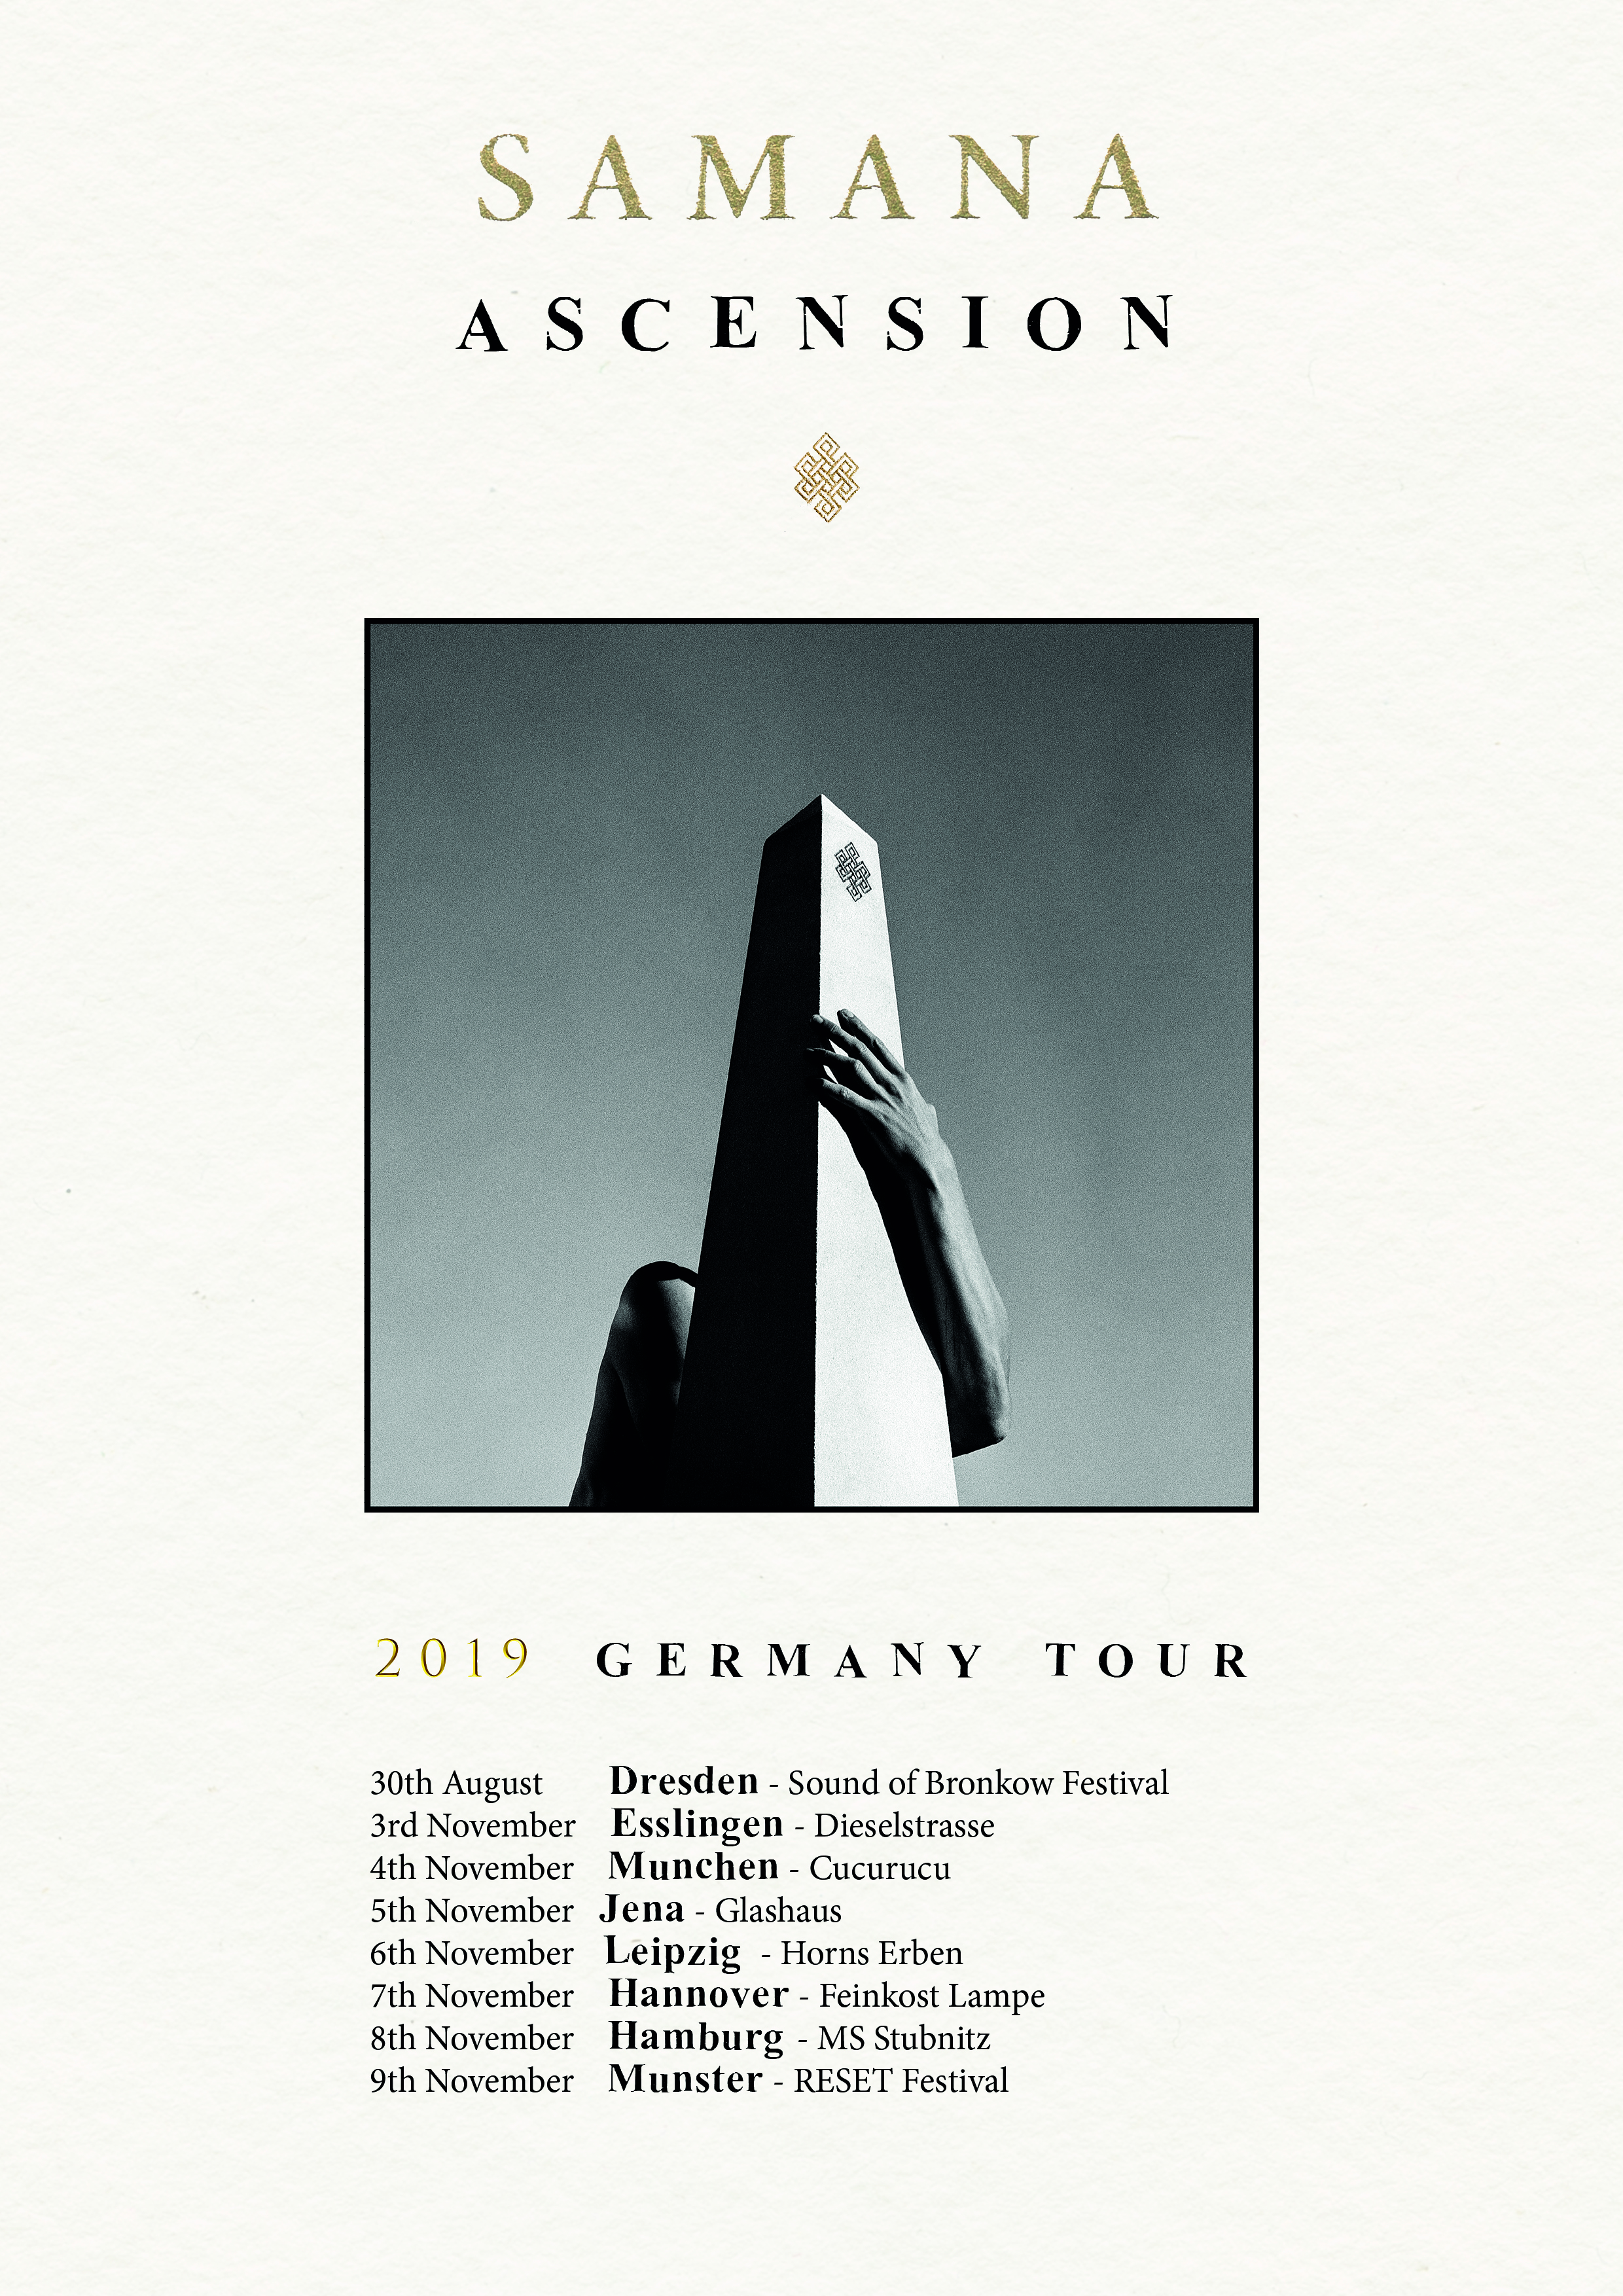 Samana Ascension Tour, Samana, Samana music, Album tour